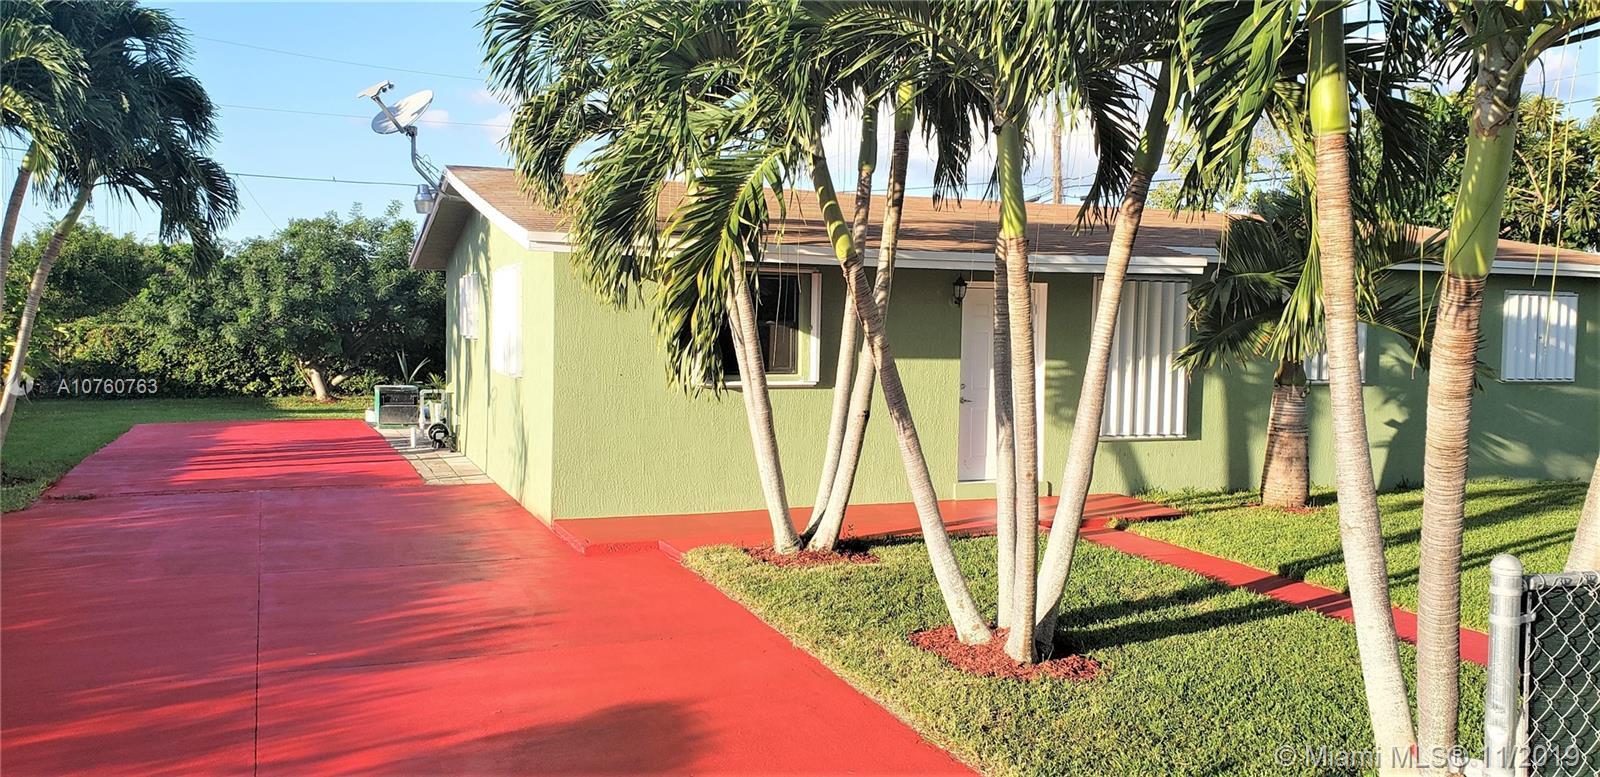 18703 SW 307 STREET, Homestead, FL 33030 - Homestead, FL real estate listing